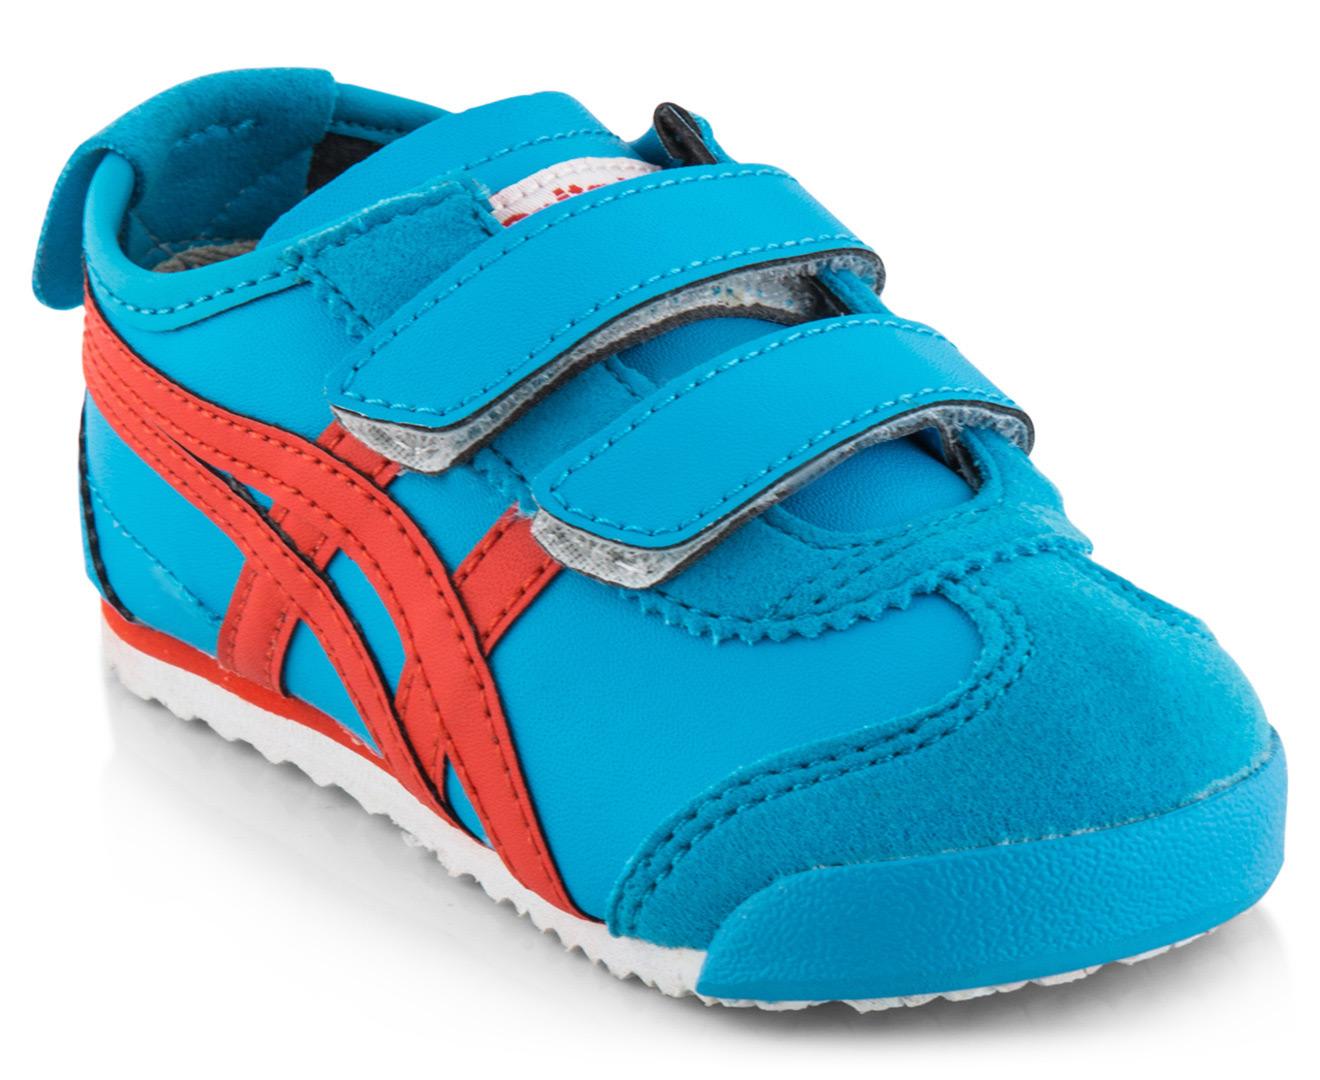 Onitsuka Tiger Toddler Mexico 66 Baja TS Shoe - Malibu Blue/Orange | Great  daily deals at Australia's favourite superstore | Catch.com.au